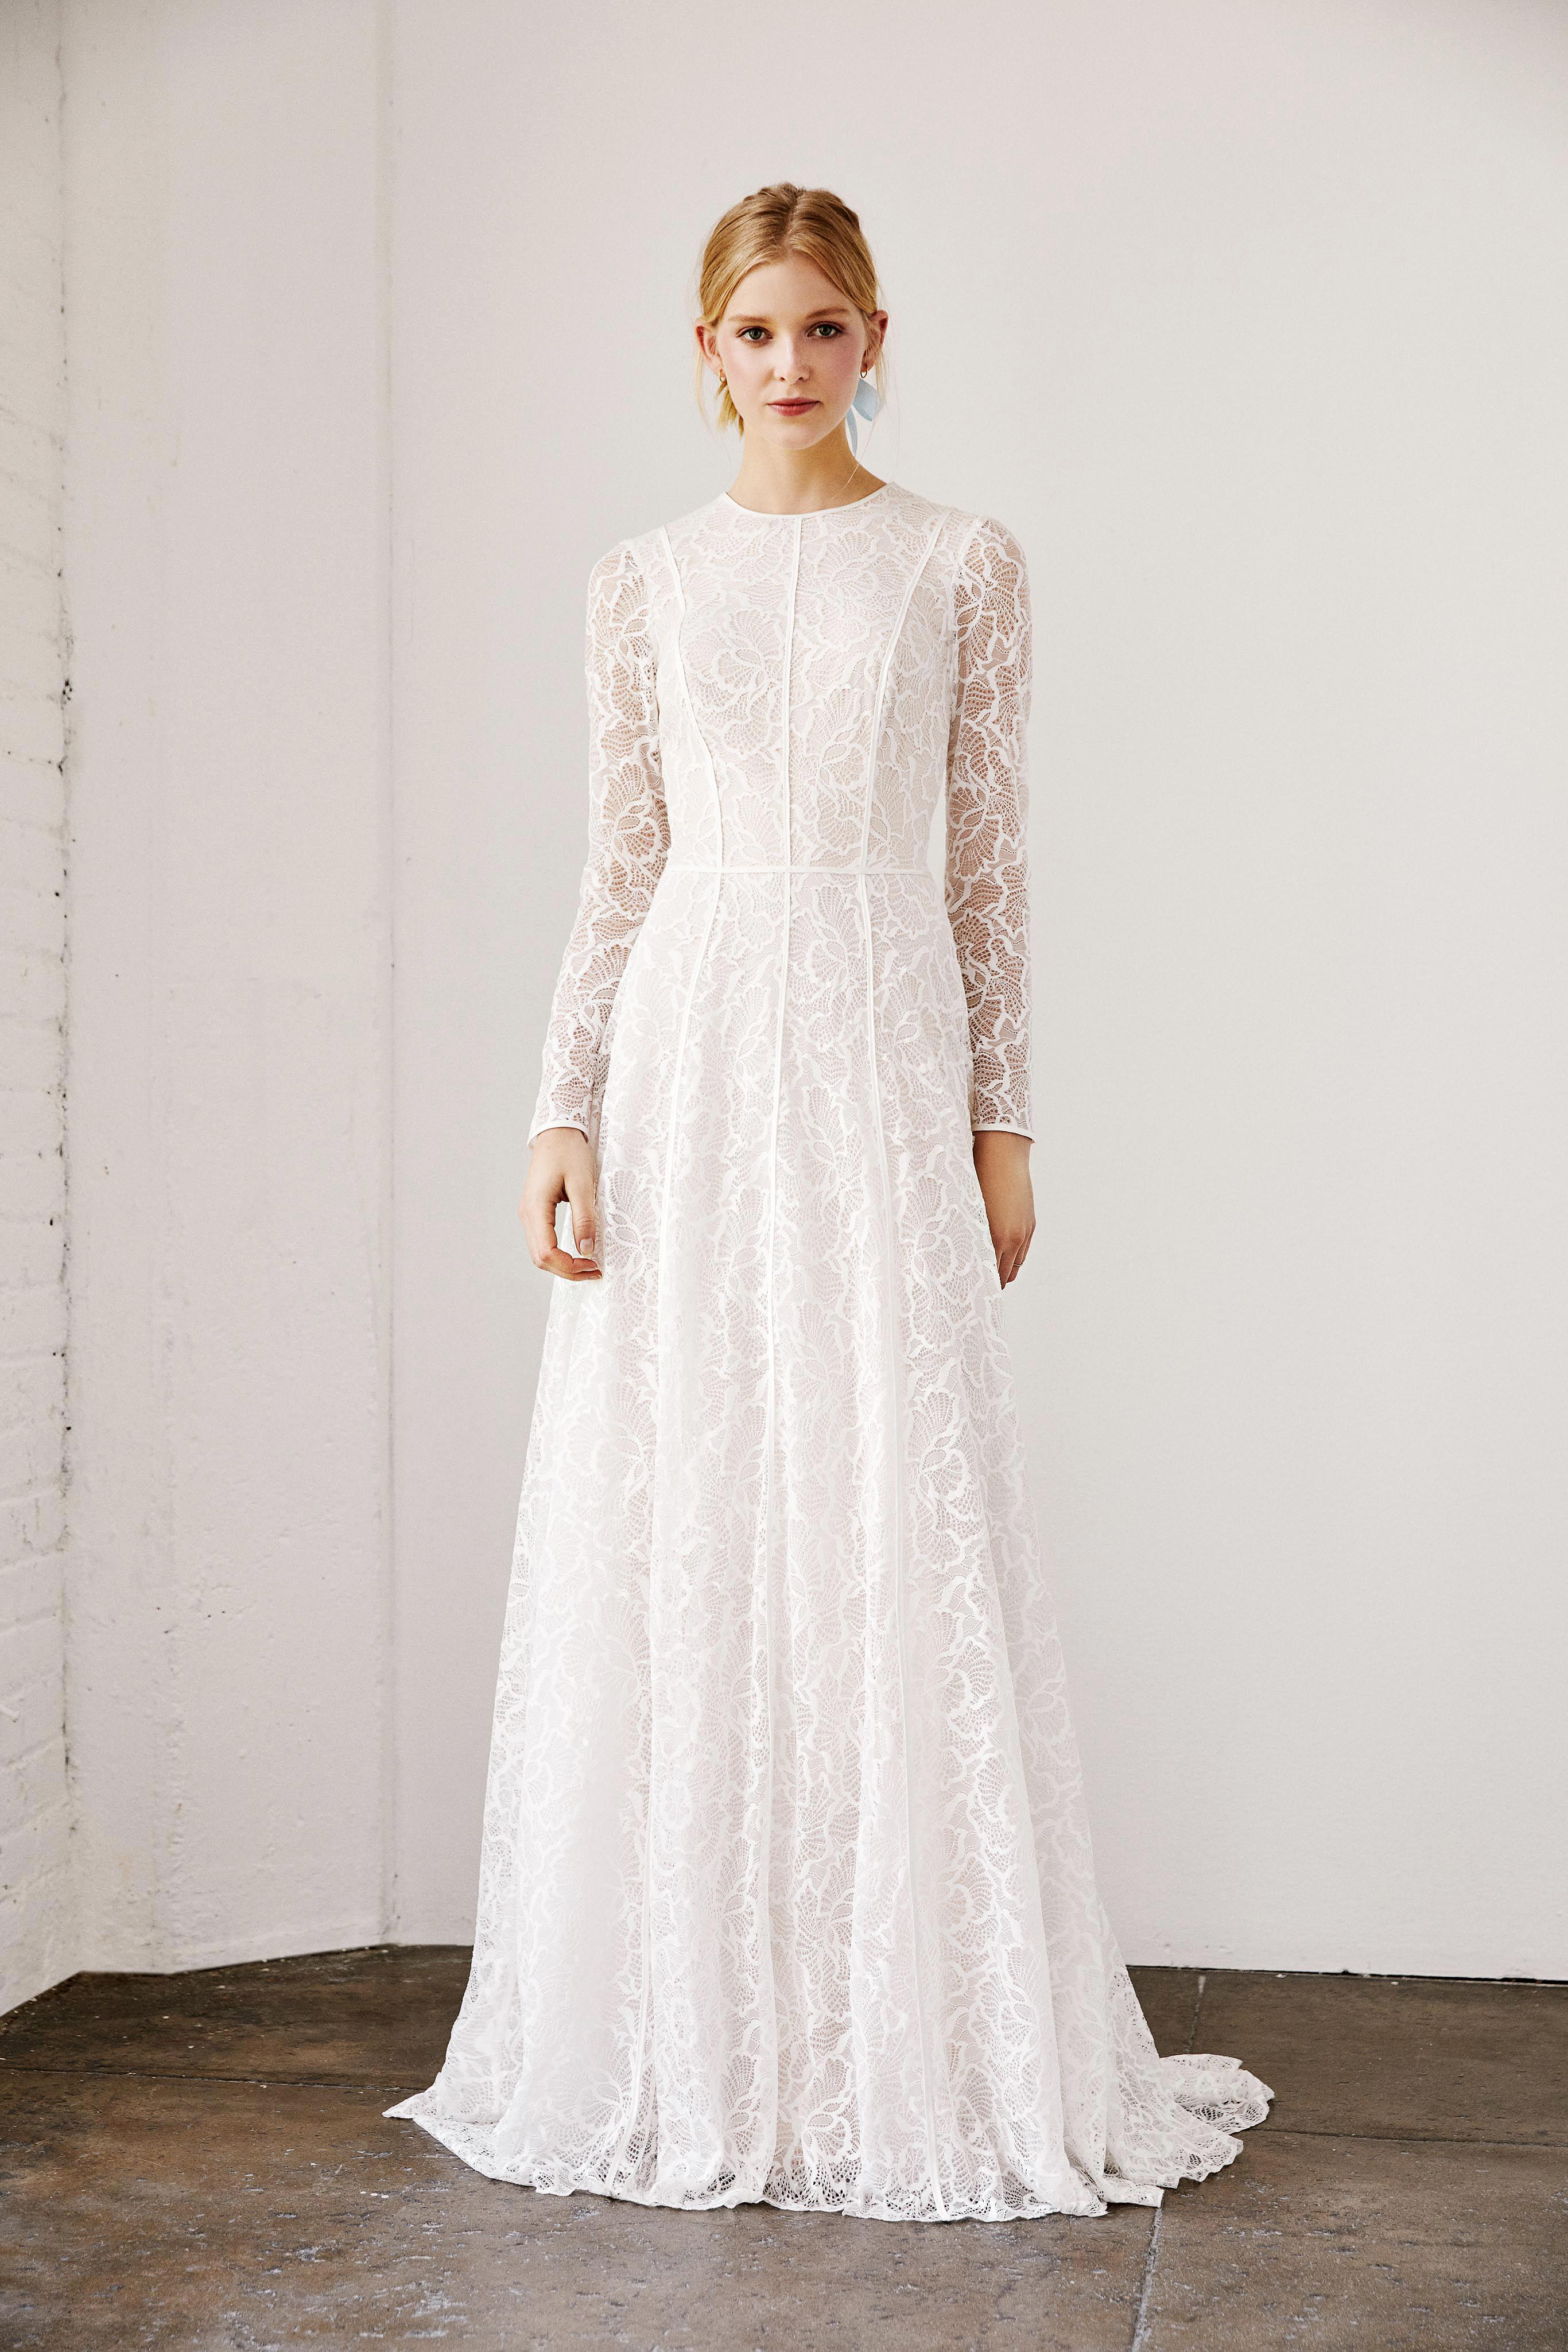 tadashi shoji wedding dress spring 2019 long sleeves lace a-line